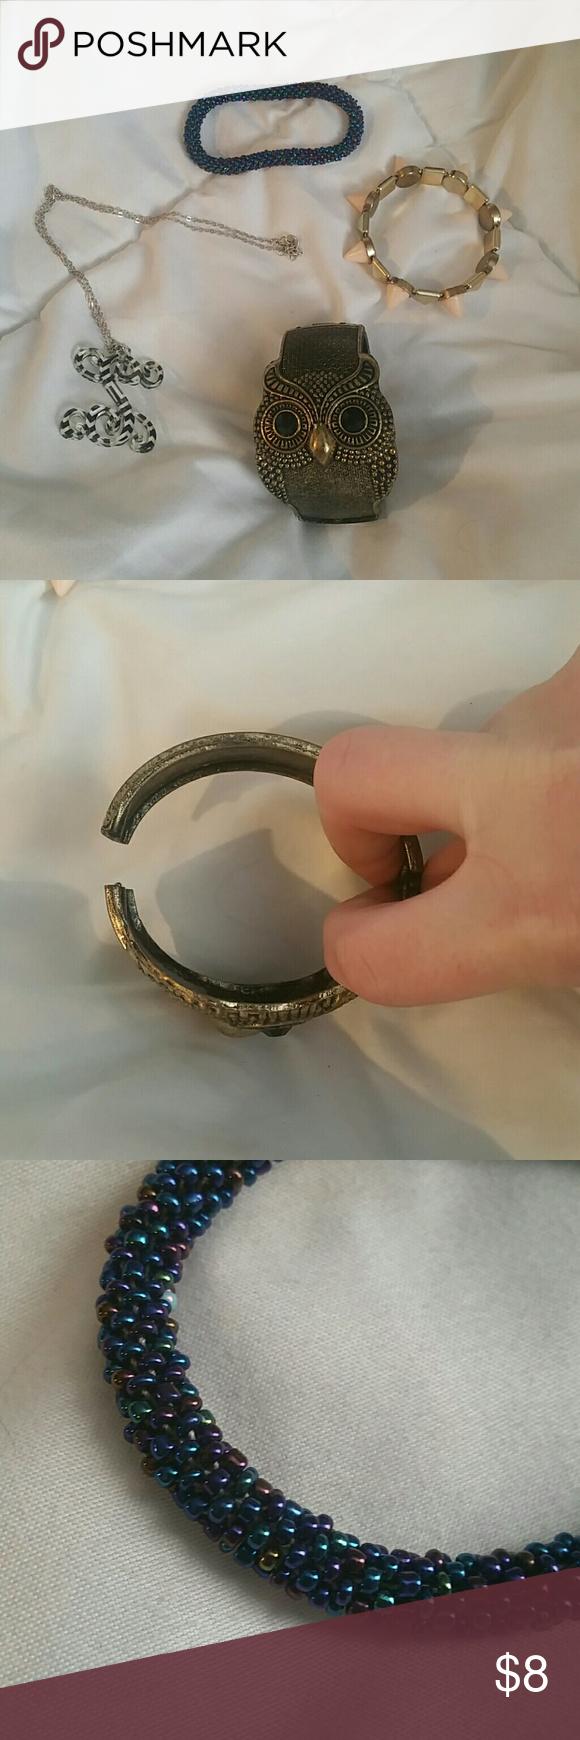 Nwot boutique jewelry *spikey stretch bracelet  *chevron print s necklace. Thin chain. *clasp largr owl bracelet  *beaded bracelet, very pretty colors Jewelry